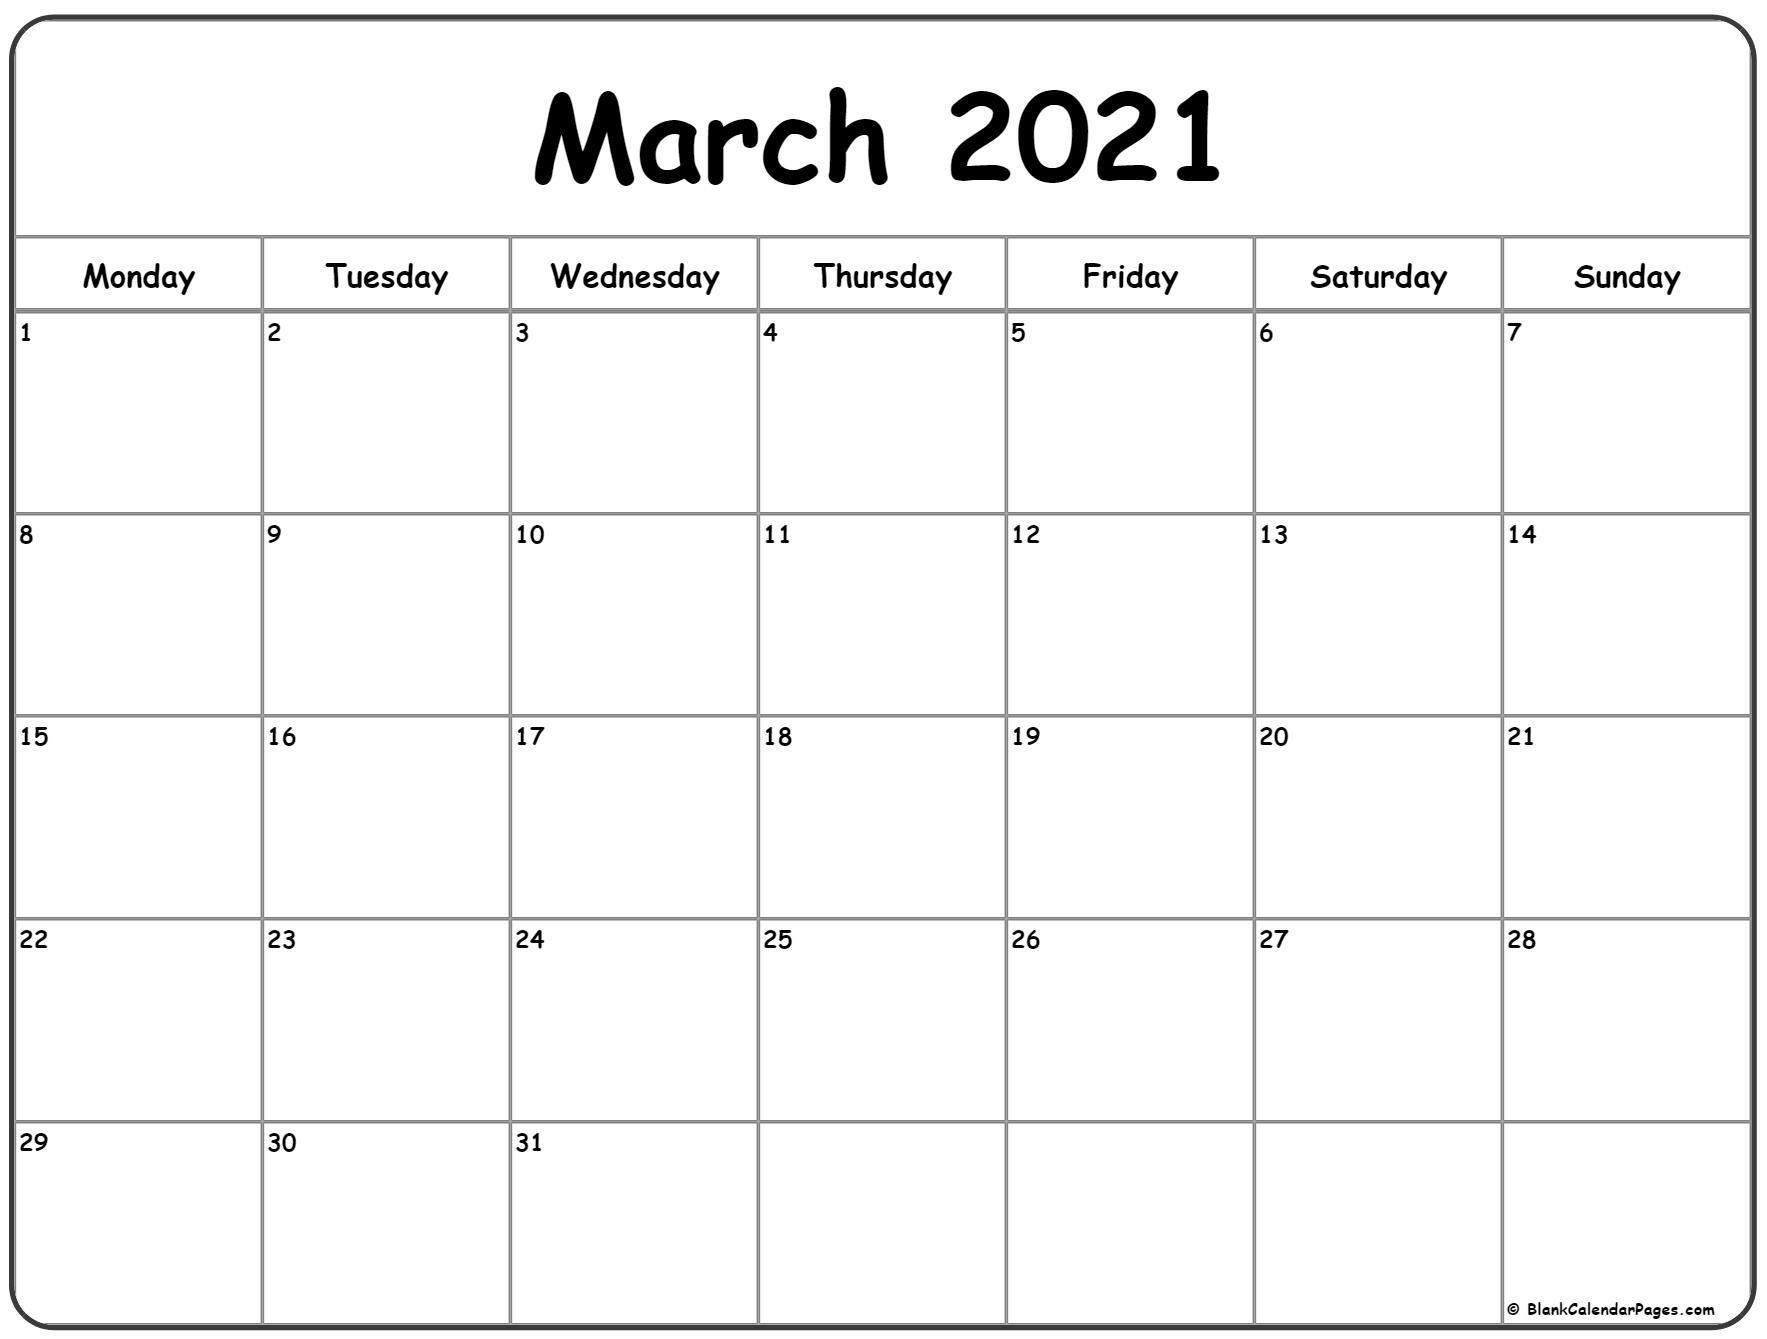 March 2021 Monday Calendar | Monday To Sunday-2021 Calendar Fill In